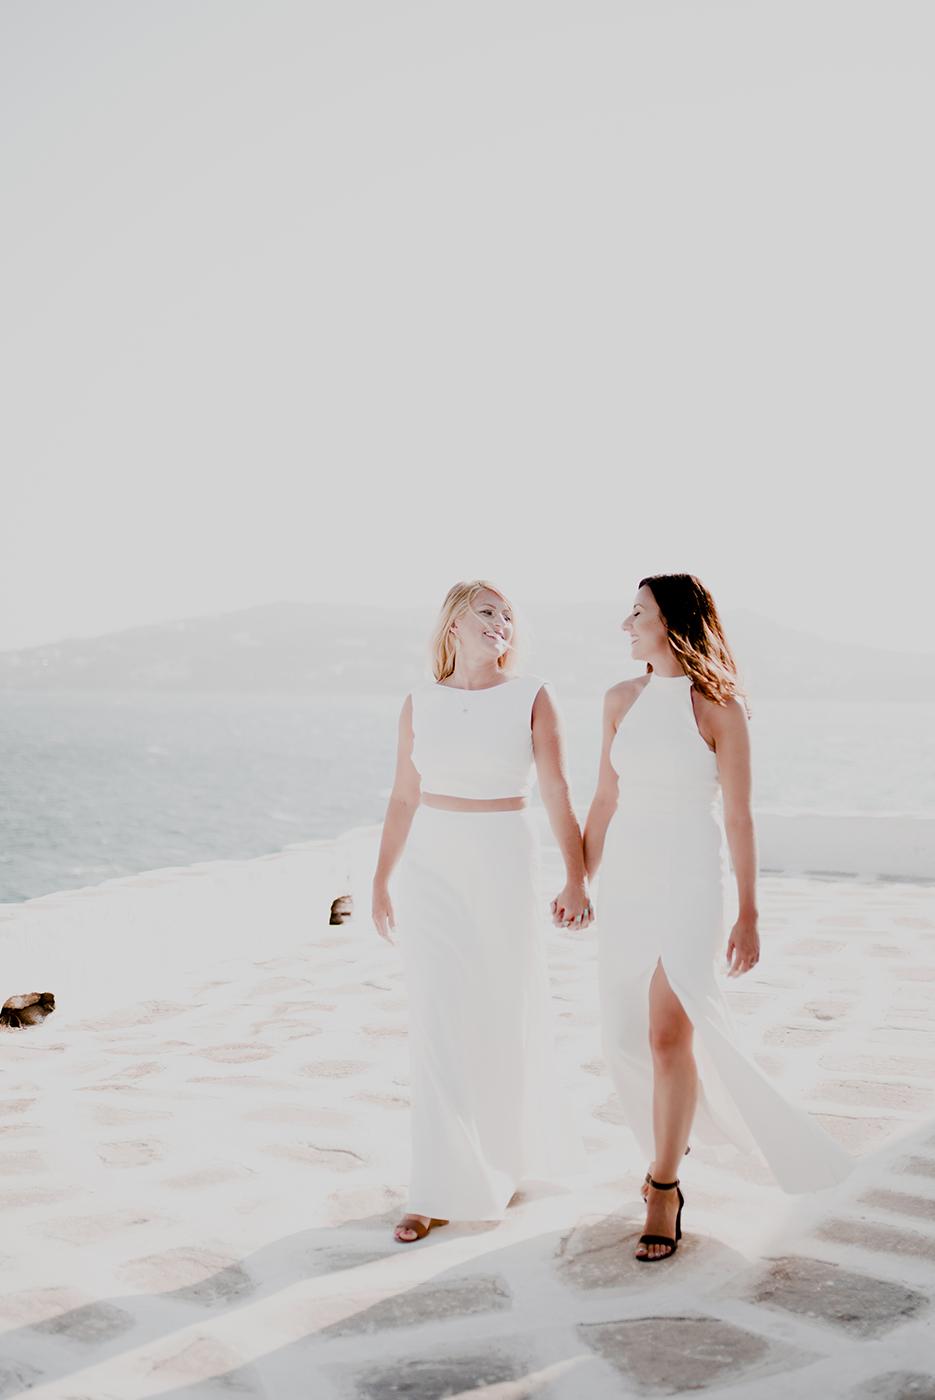 Kirill-Samarits-Wedding-Photography-Greece-AThens-Mykonos-Santorini-Same-Sex-Wedding-Photographer-Candice-Mykonos